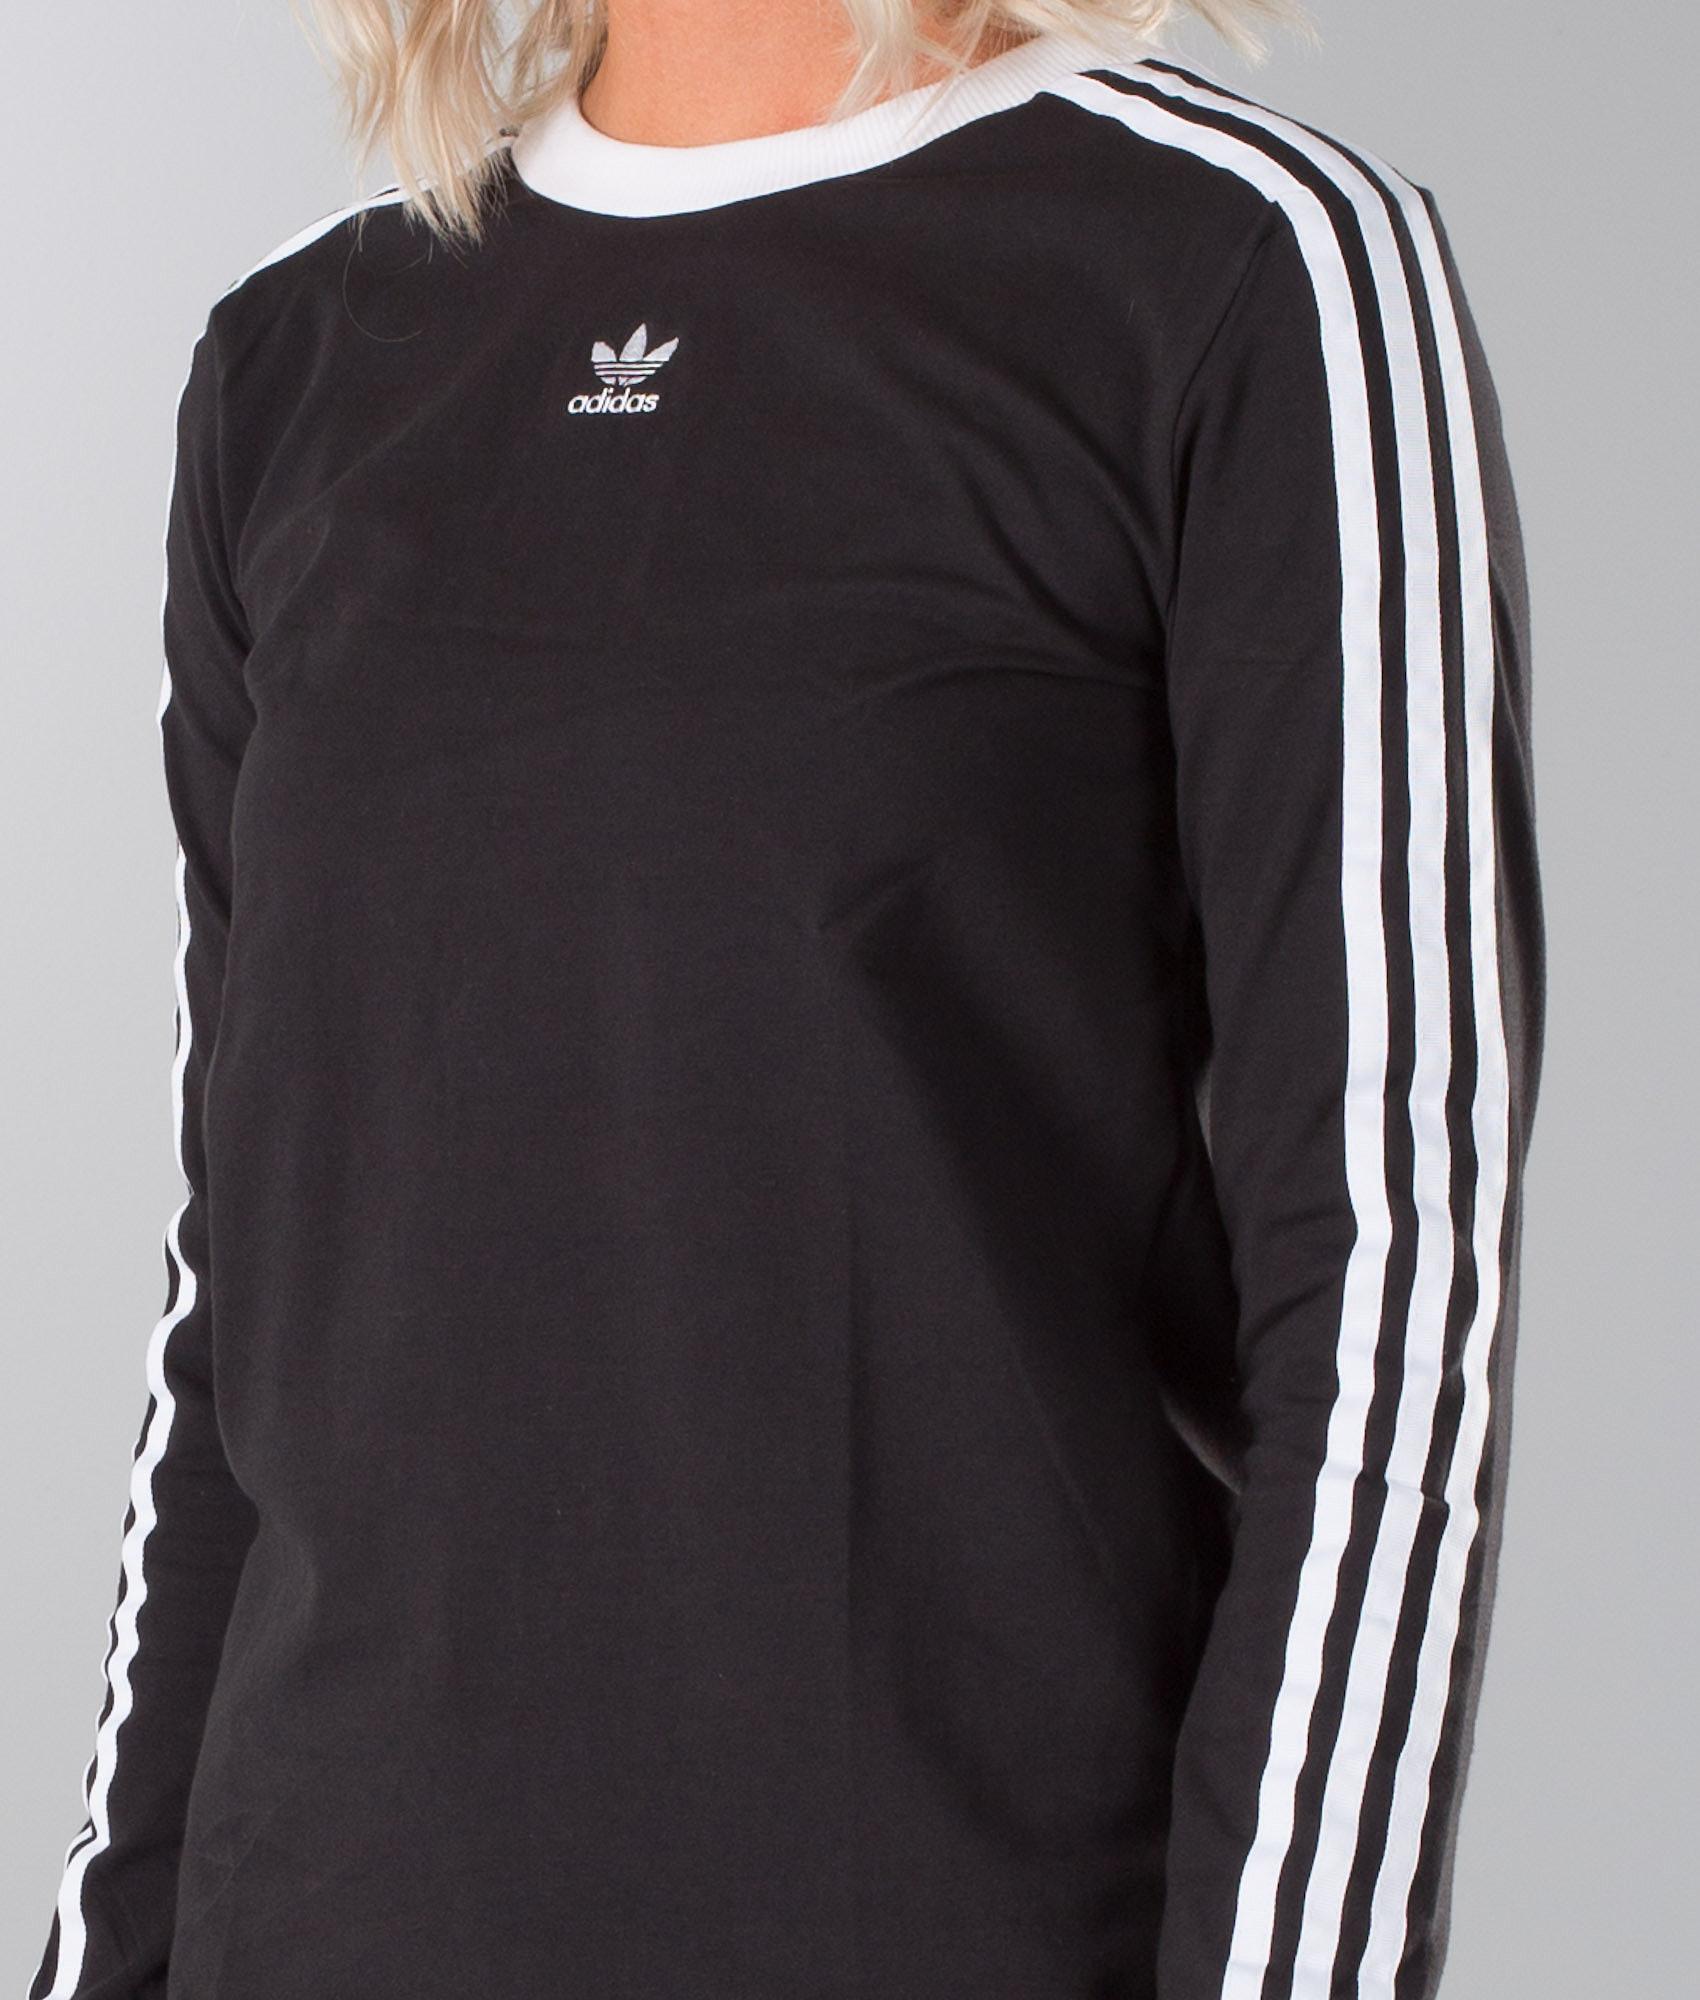 299caedf Adidas Originals 3 Stripes Longsleeve Black - Ridestore.com